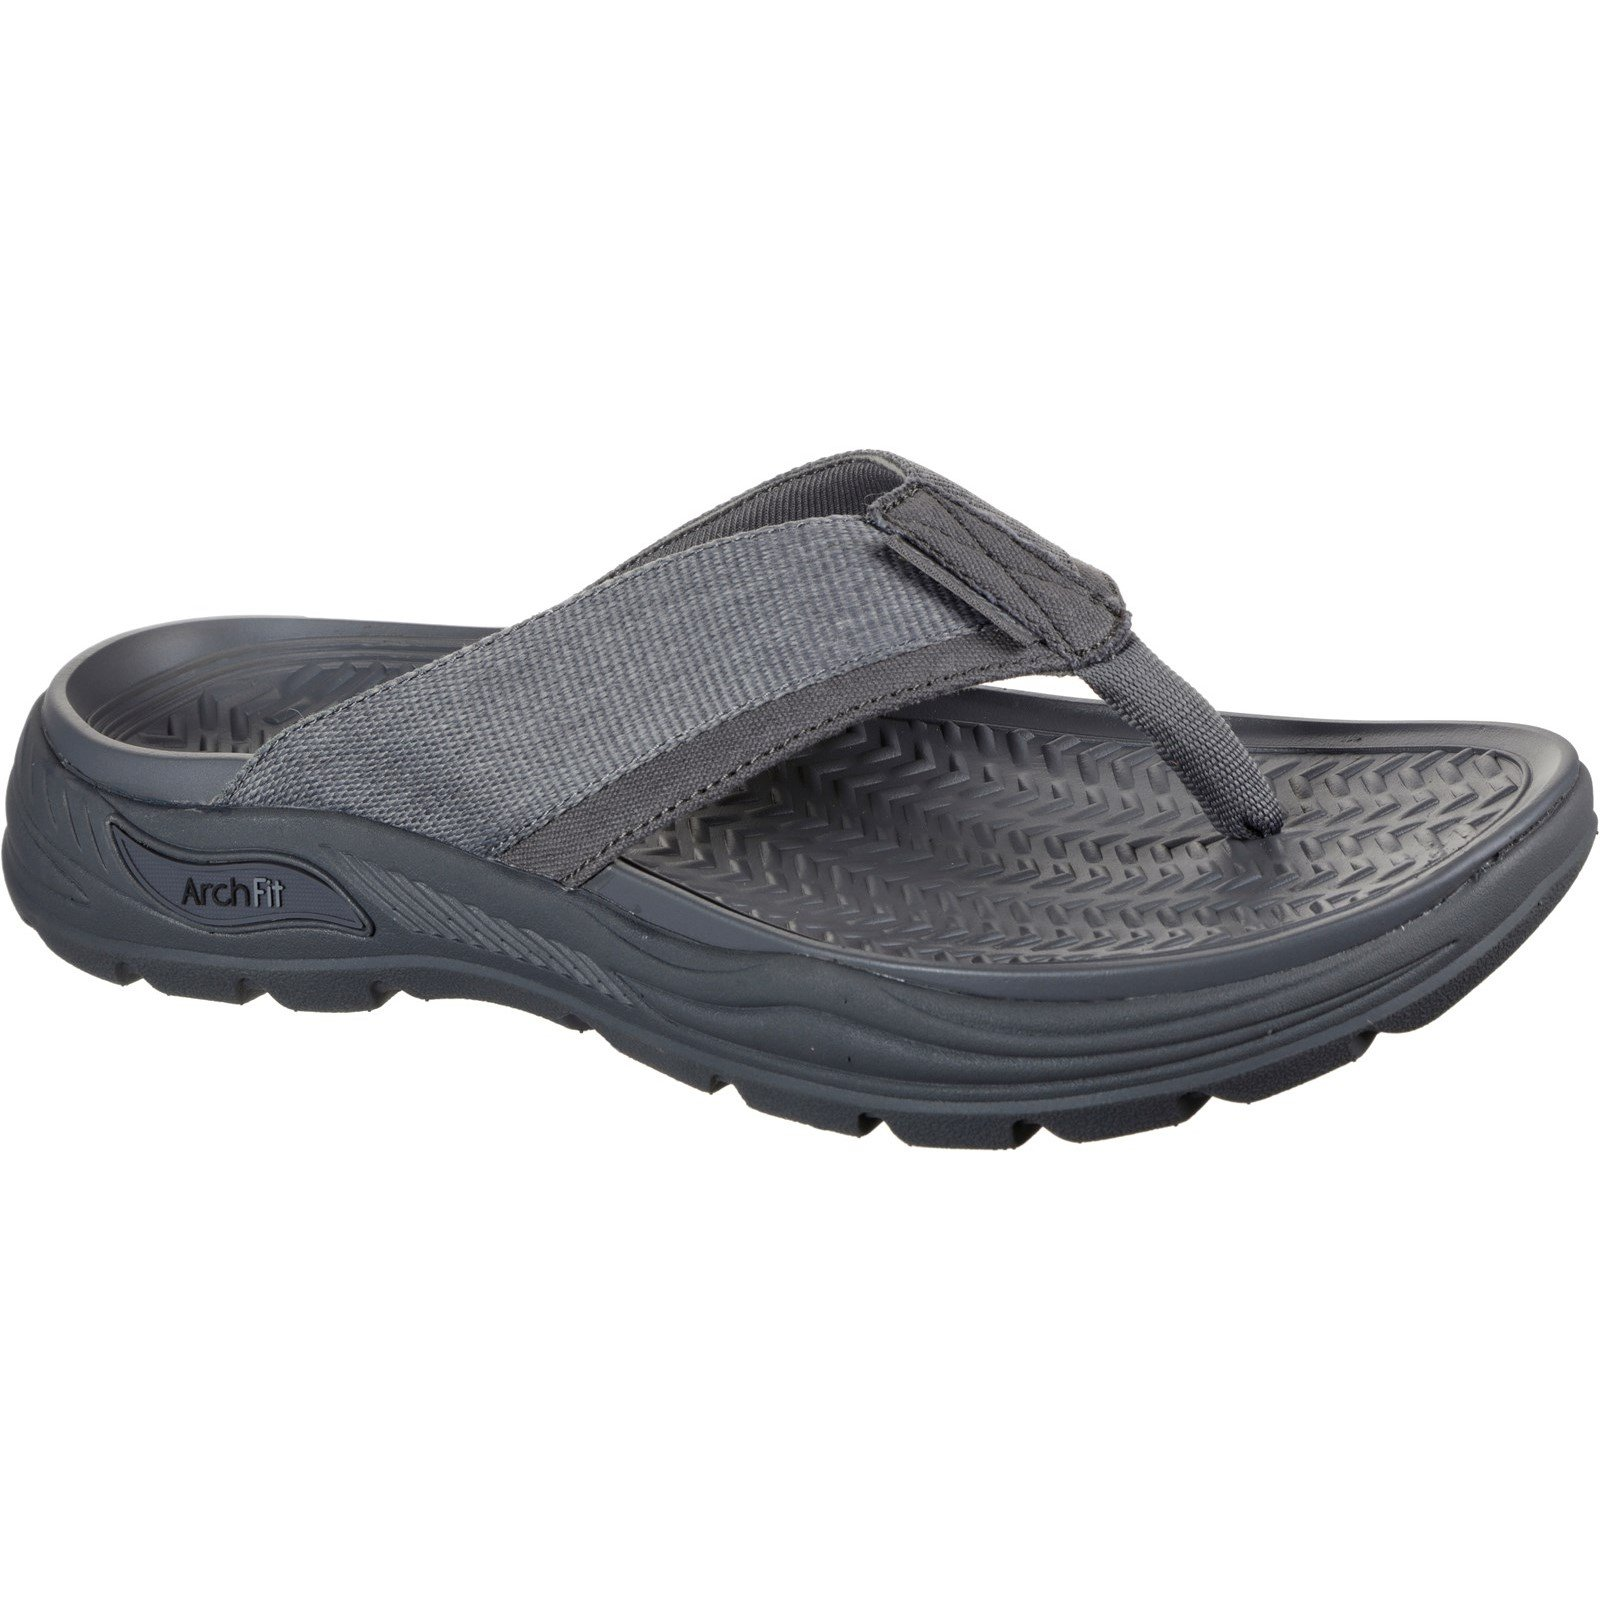 Skechers Men's Arch Fit Motley Dolano Summer Sandal Charcoal 32209 - Charcoal 9